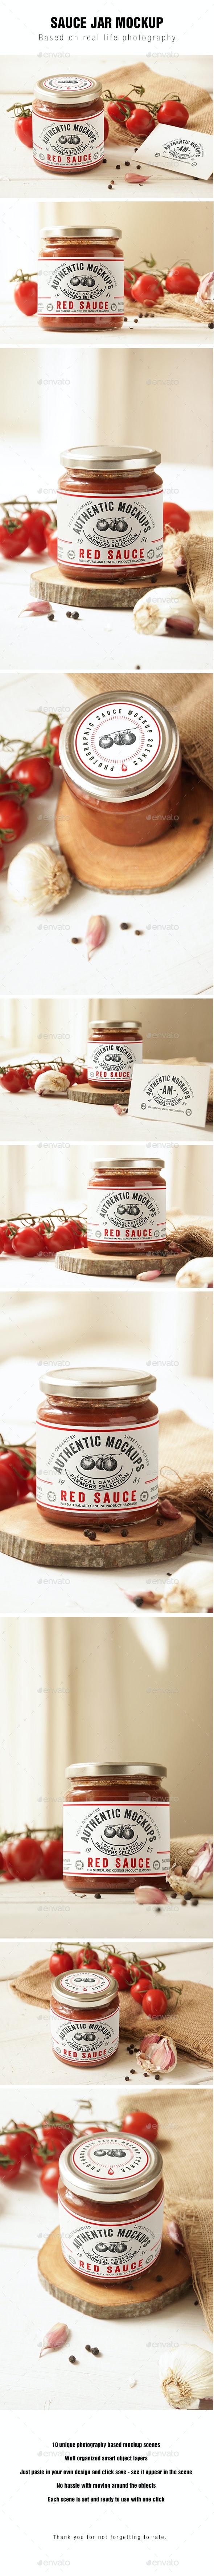 Sauce Jar Label Mockup - Product Mock-Ups Graphics